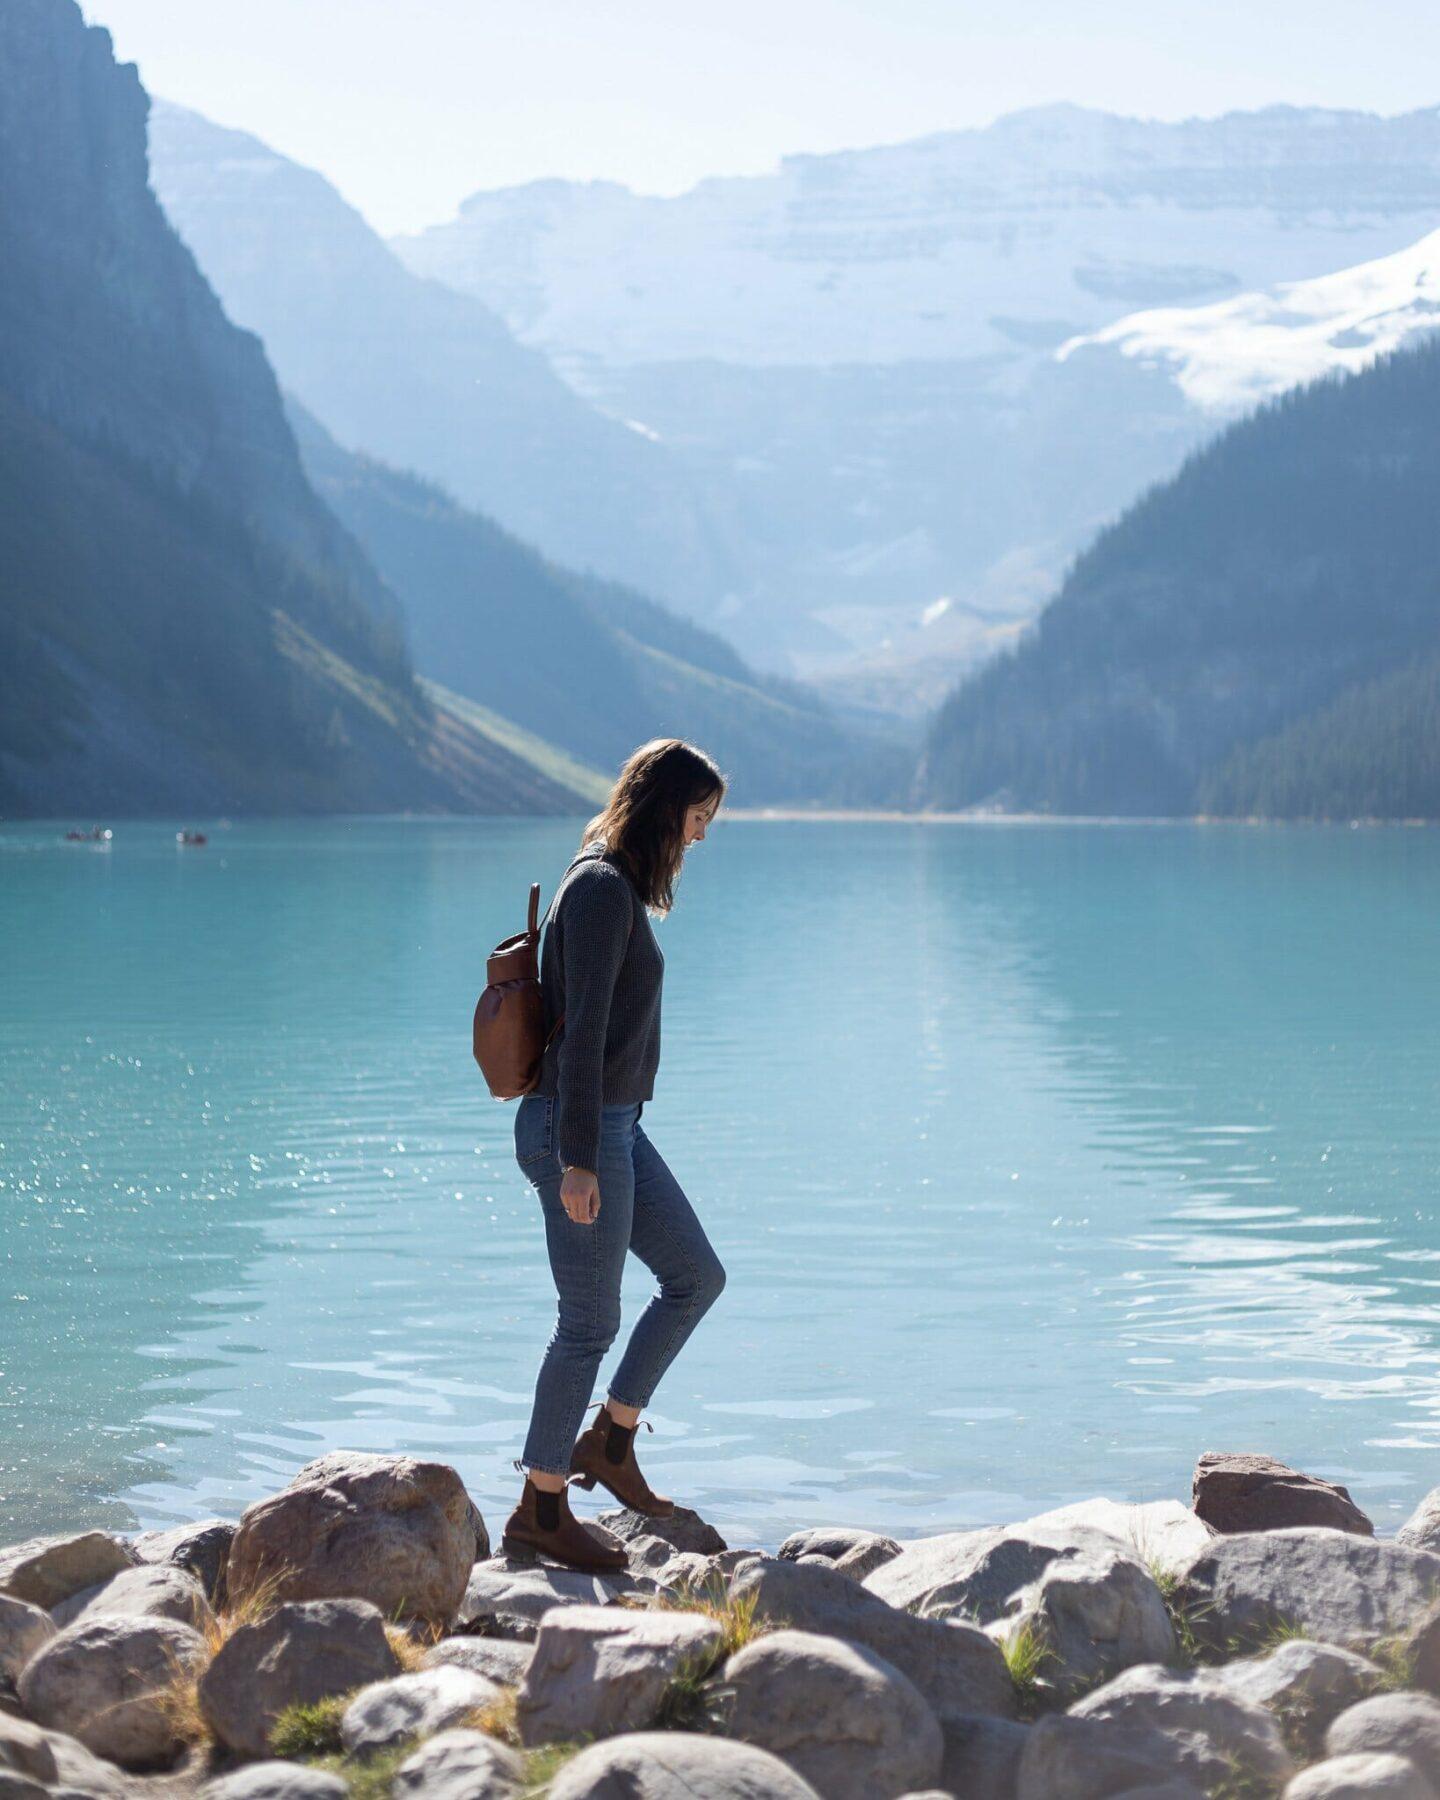 Photo spots in Banff